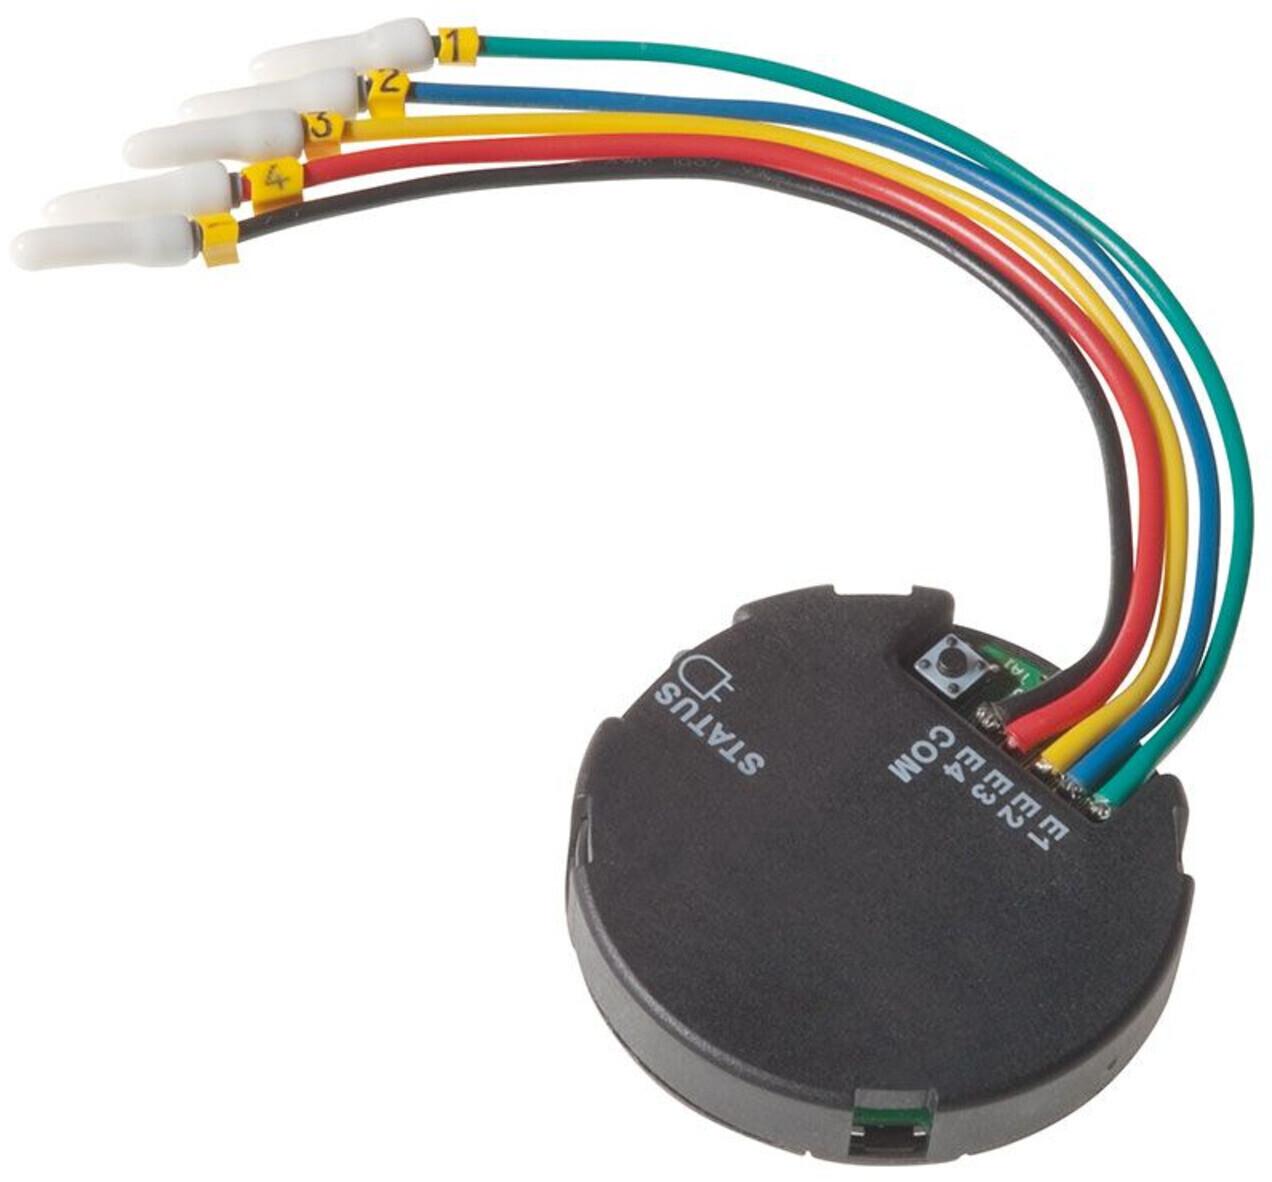 HomeMatic Funk-Tasterschnittstelle 4-fach (HM-PBI-4-FM)